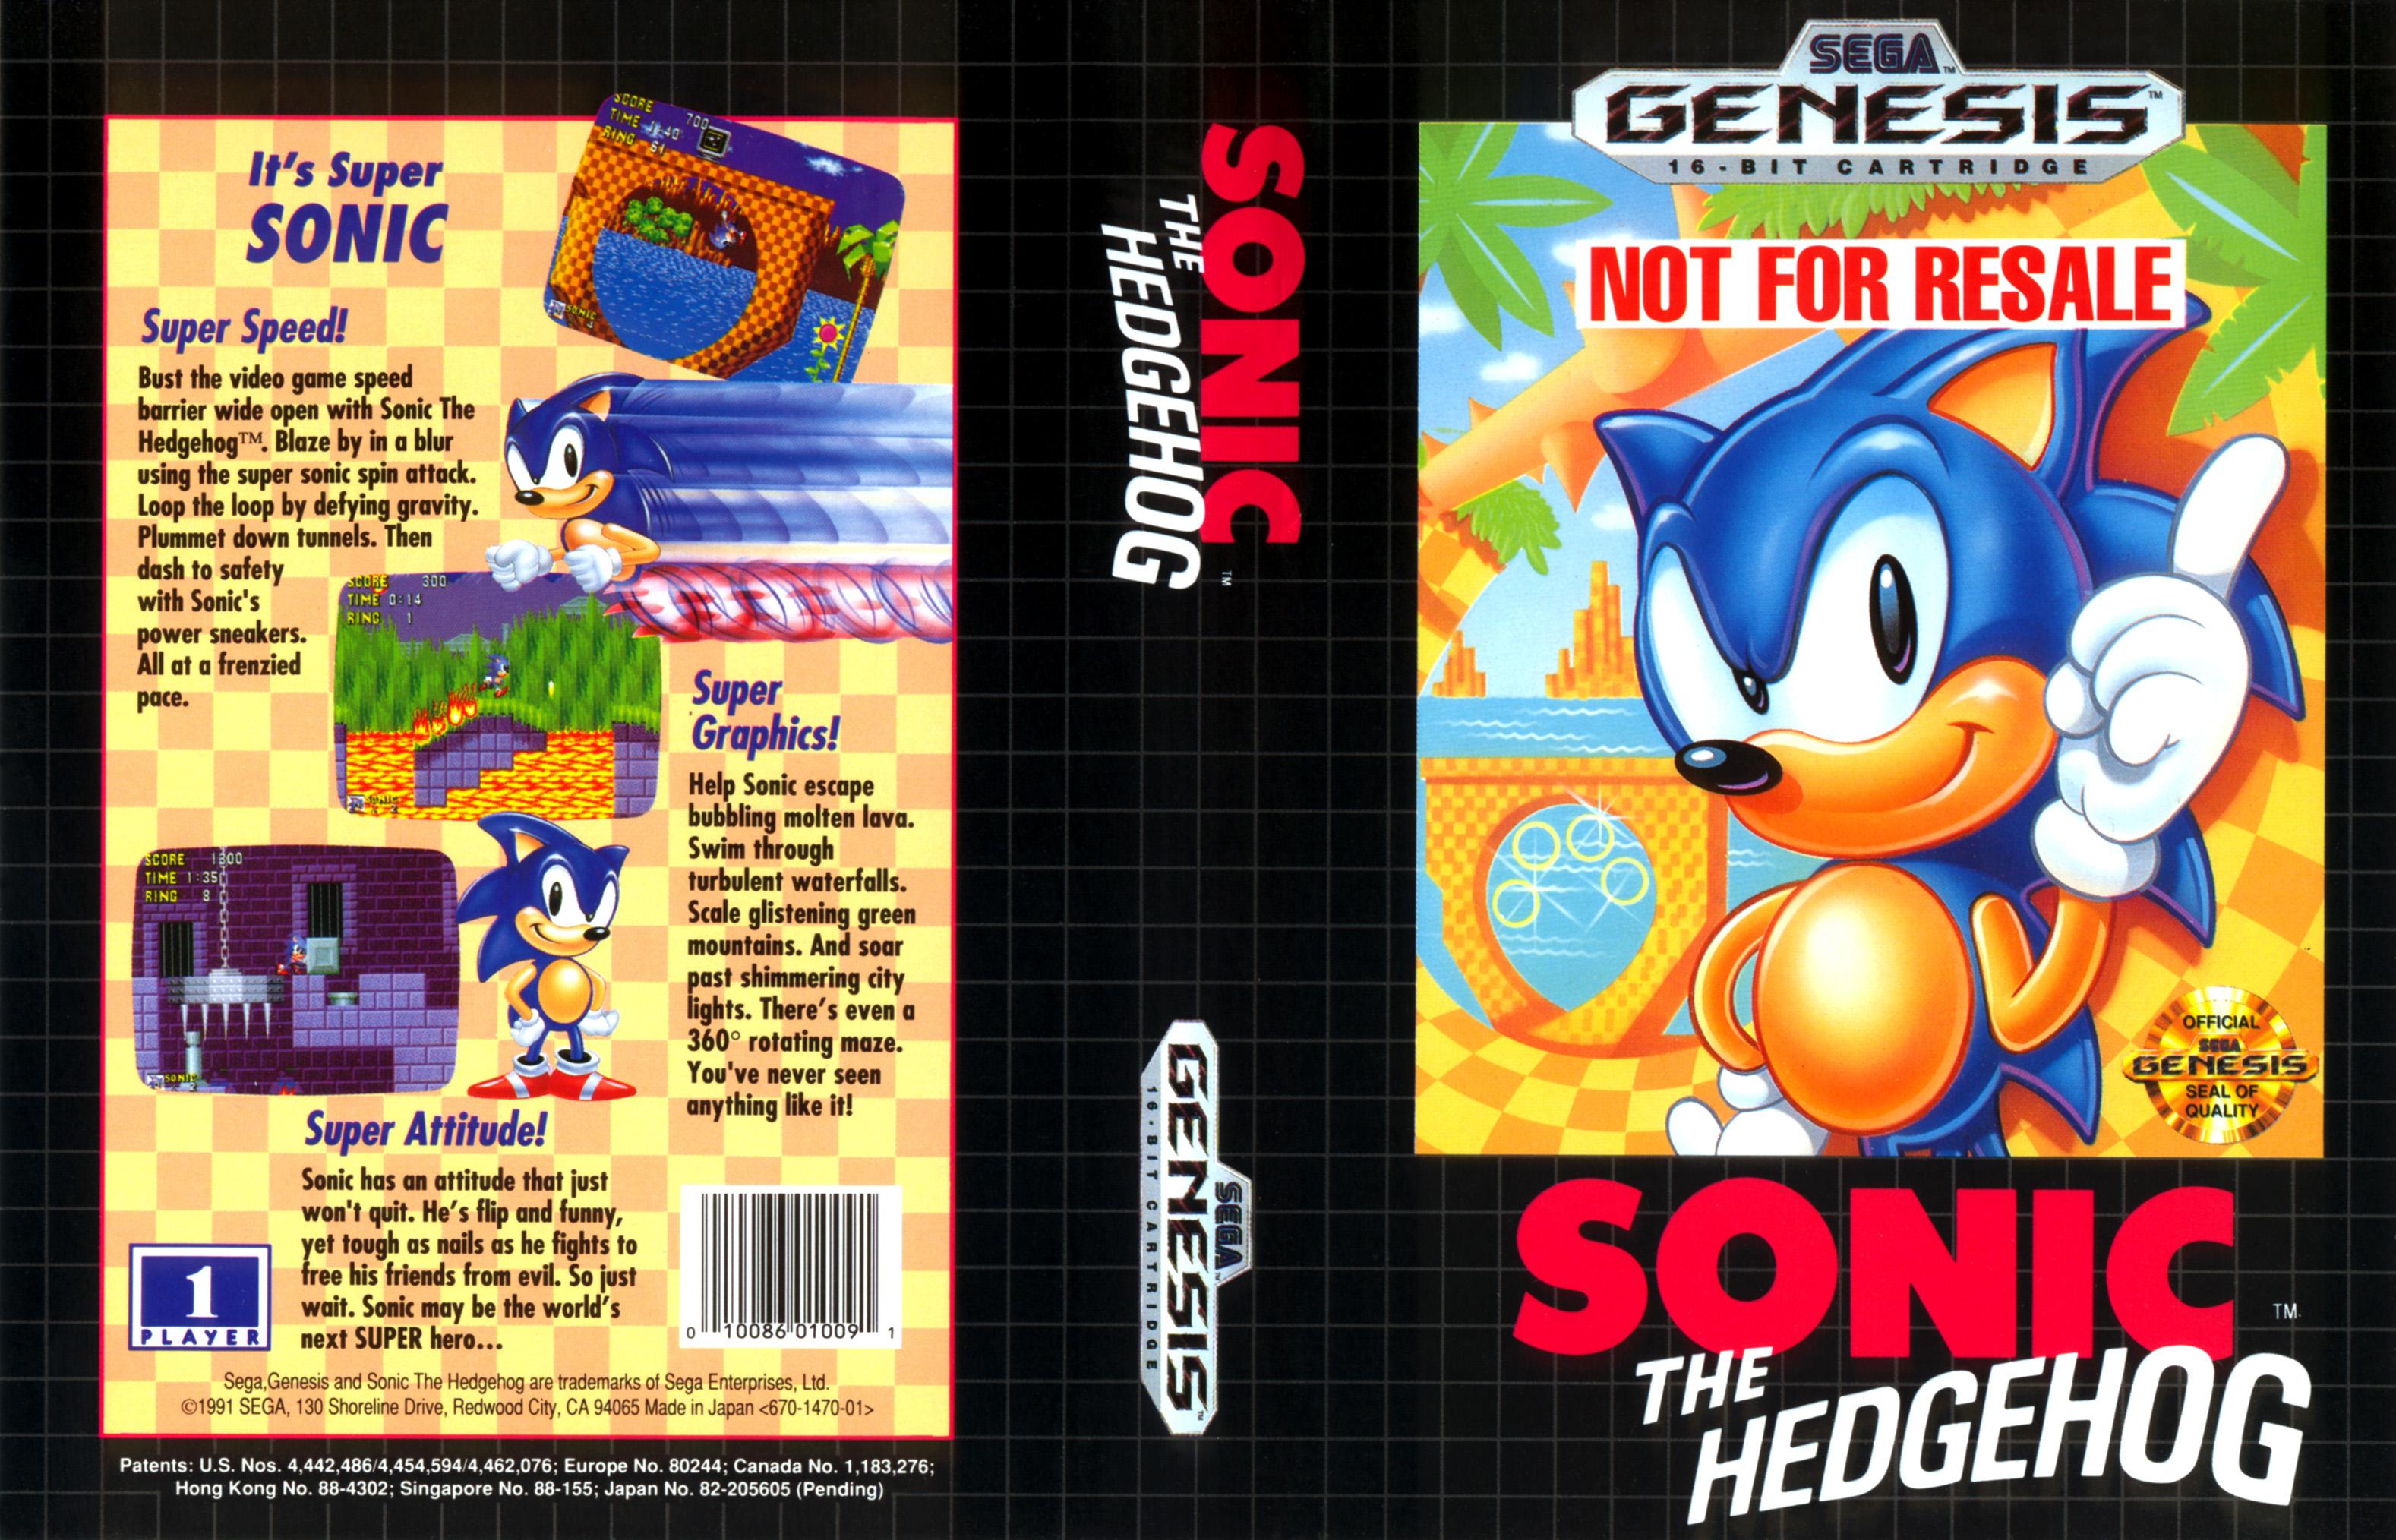 Sonic the Hedgehog (Sega Genesis)